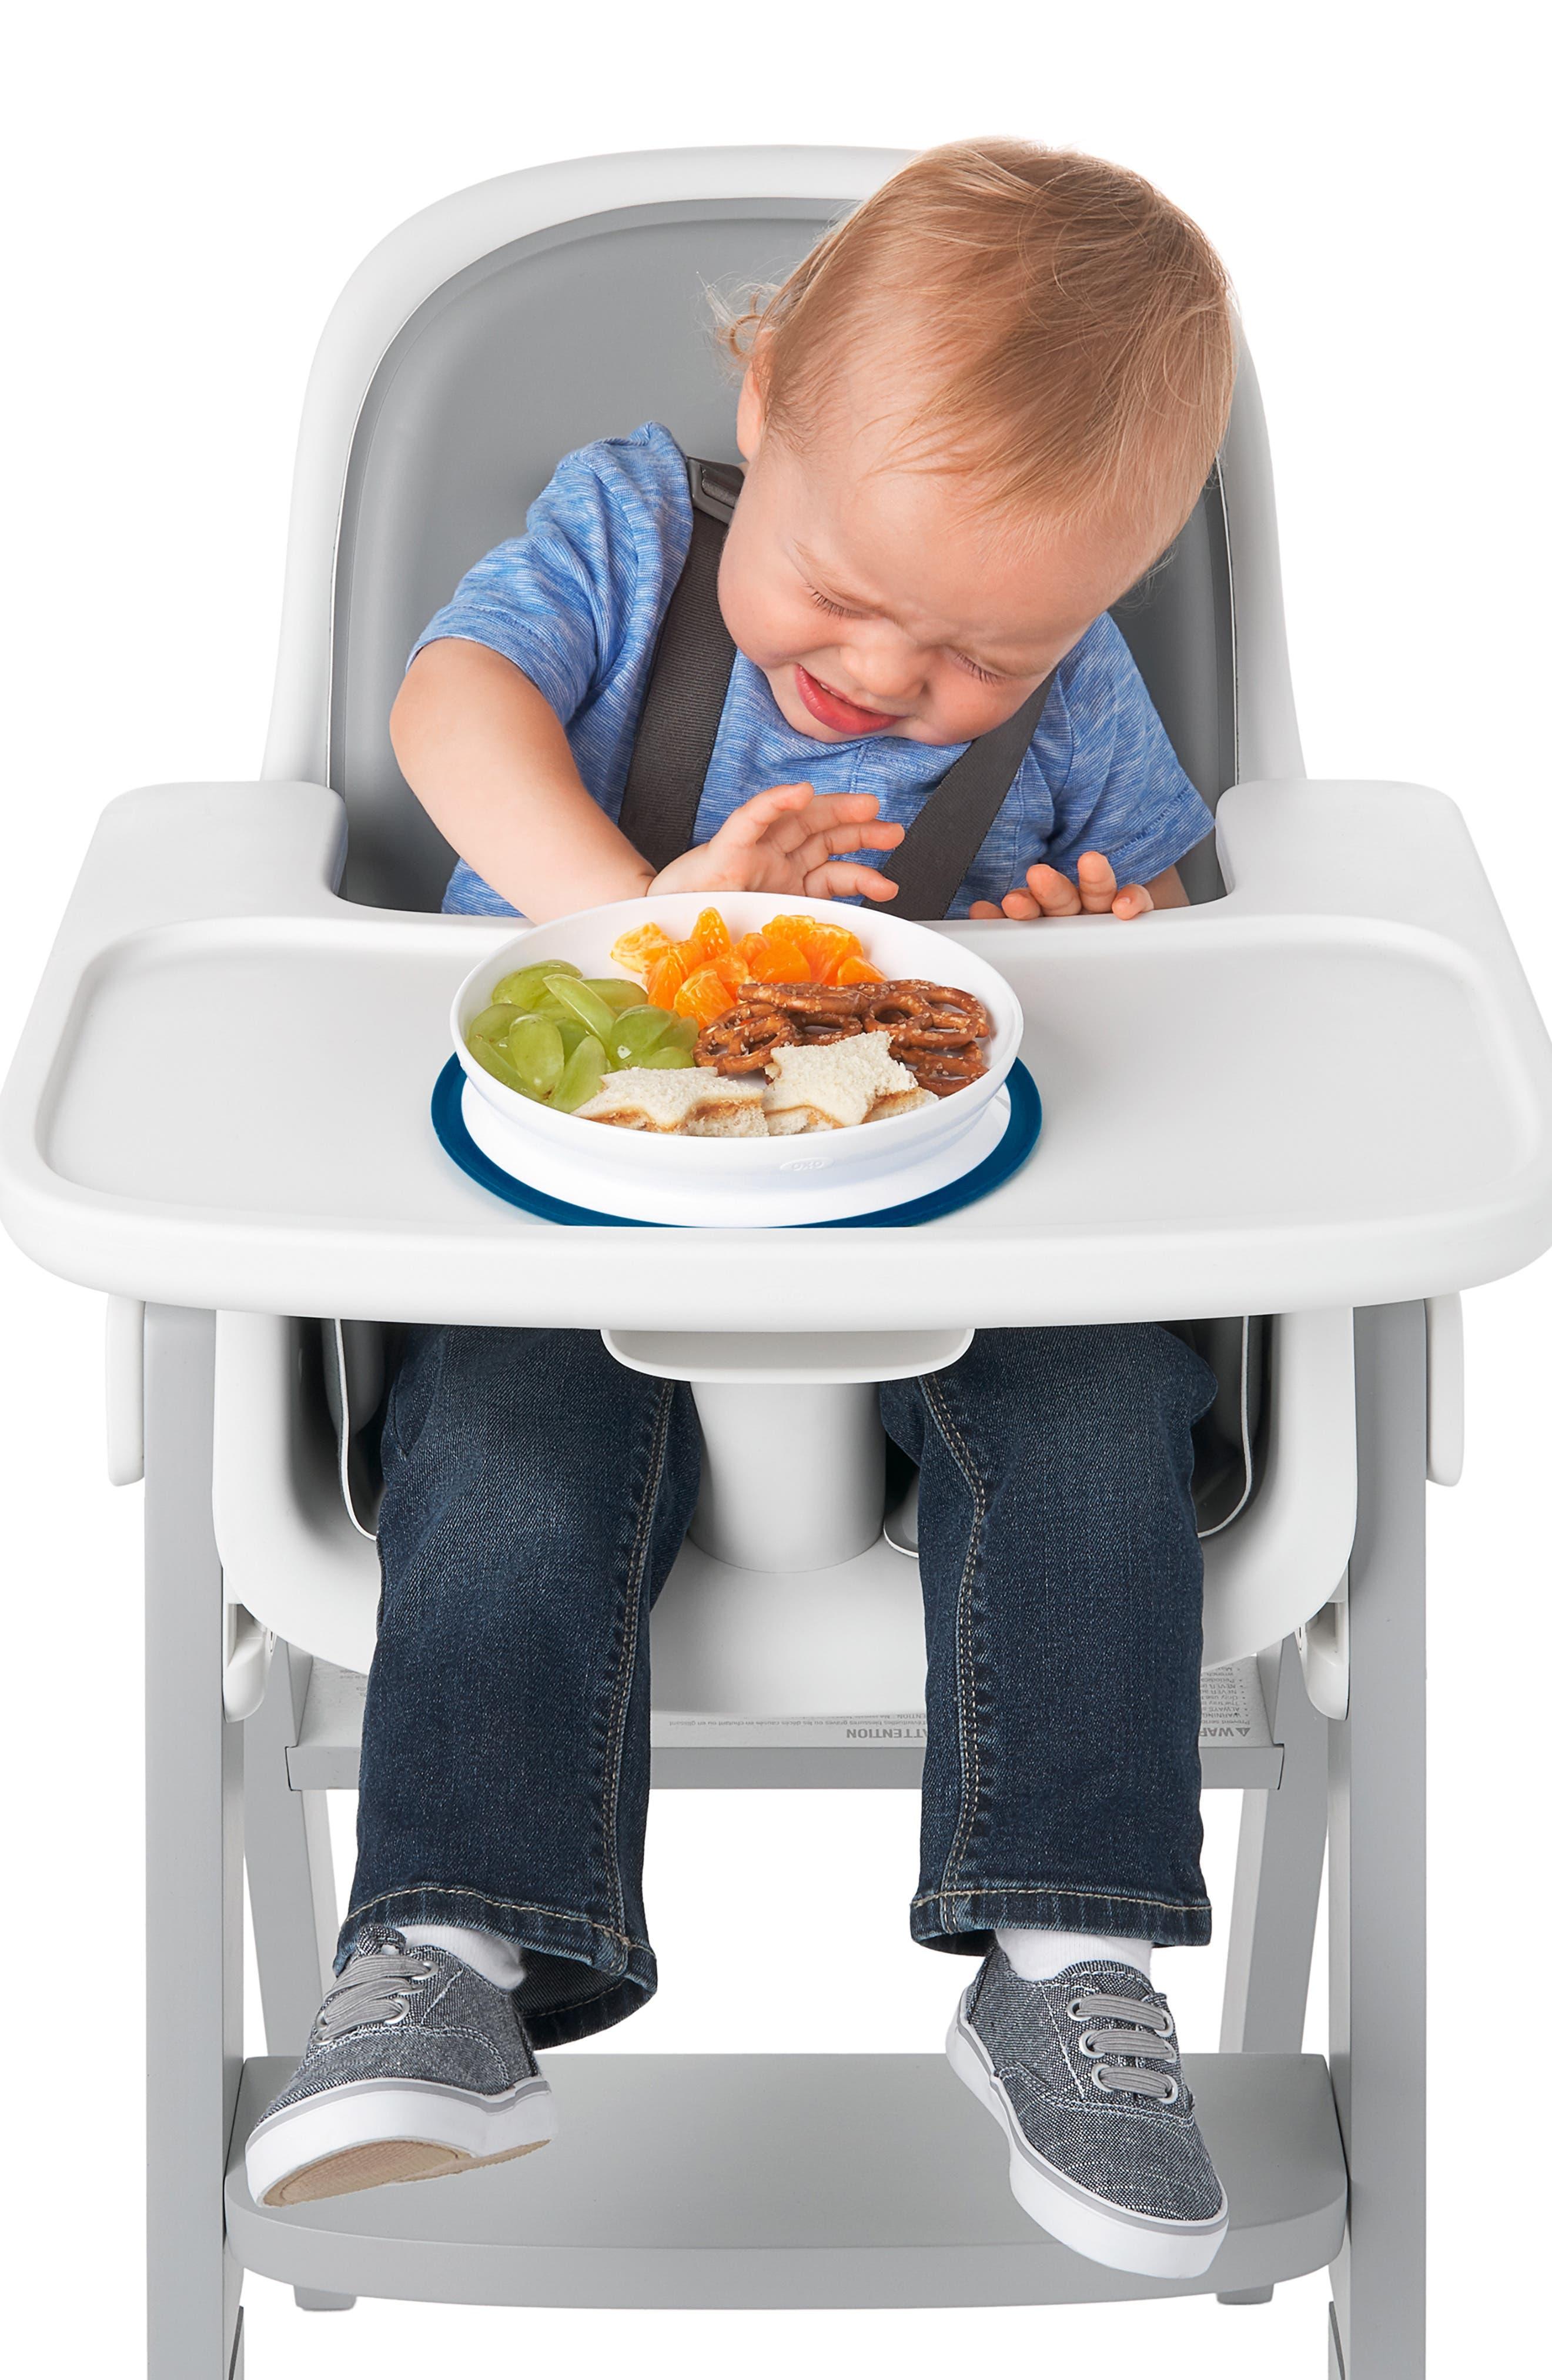 Infant Oxo Tot Stick  Stay Plate  Bowl Set Size One Size  Blue